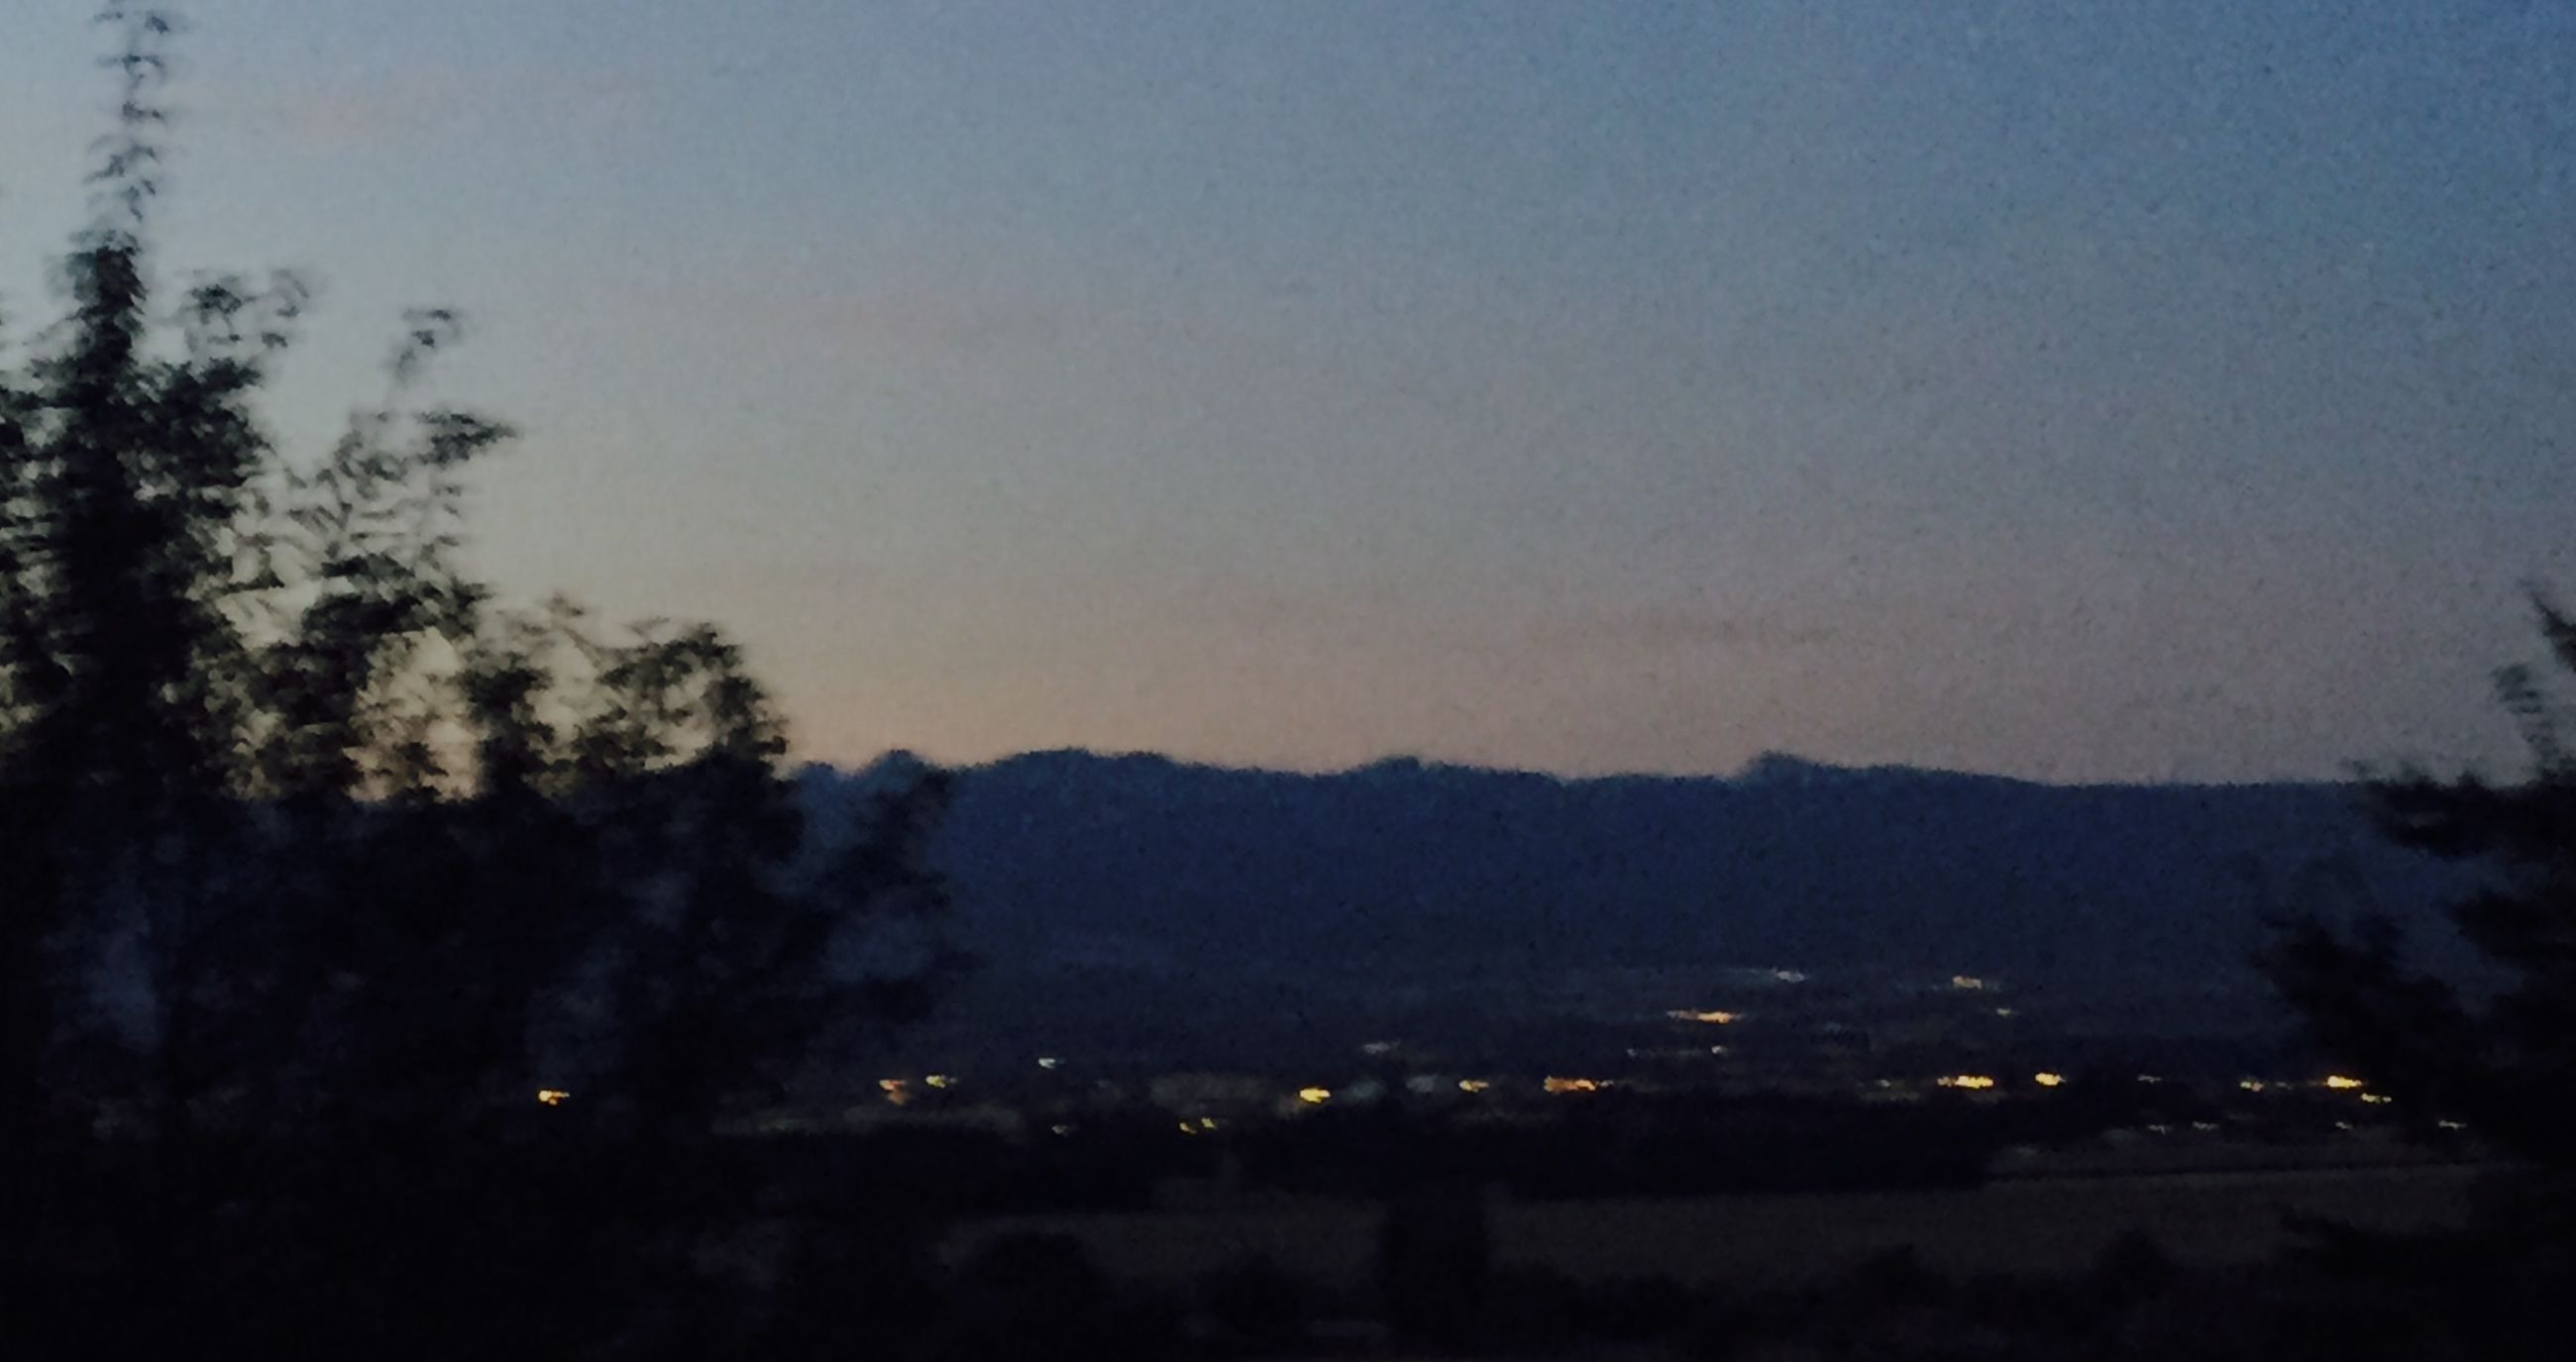 night, illuminated, mountain, dusk, sky, scenics, landscape, tree, beauty in nature, dark, tranquil scene, nature, tranquility, outdoors, mountain range, no people, idyllic, cloud - sky, blue, cloud, weather, growth